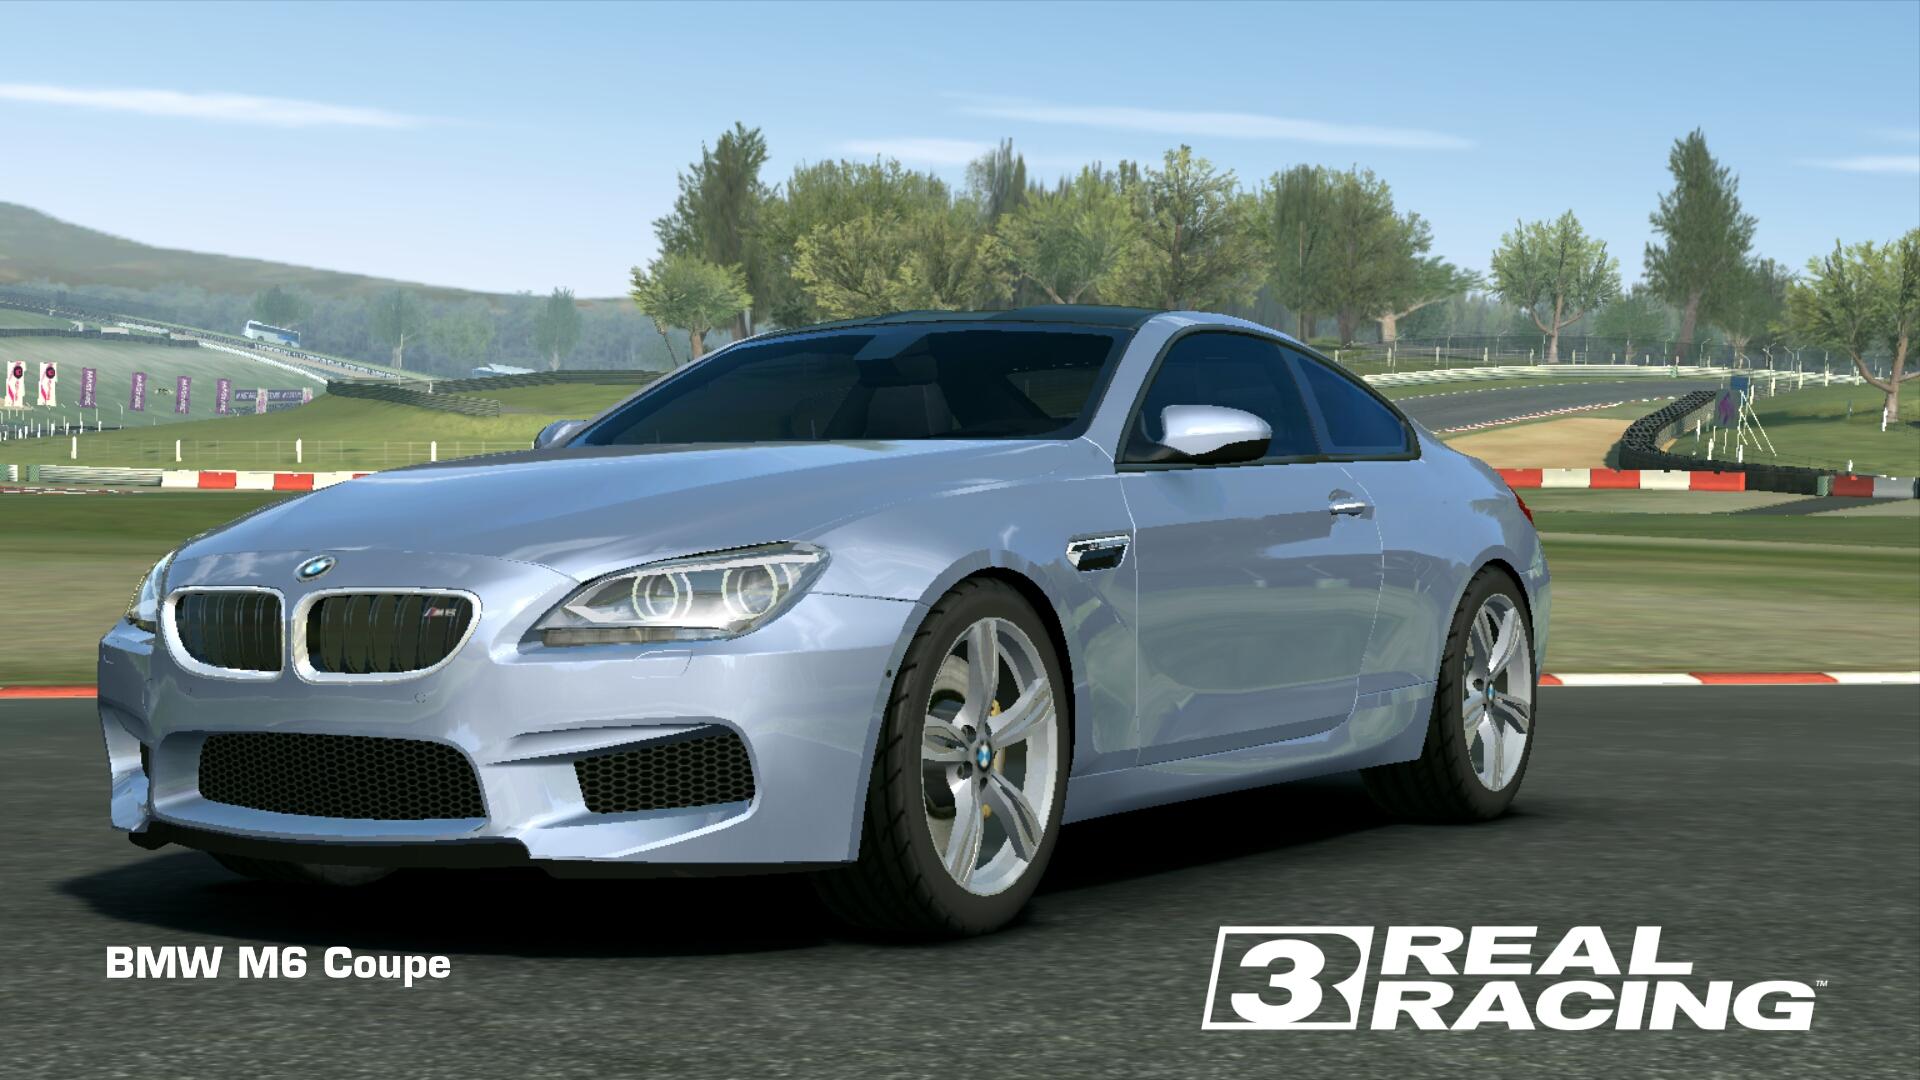 Showcase BMW M6 Coupe